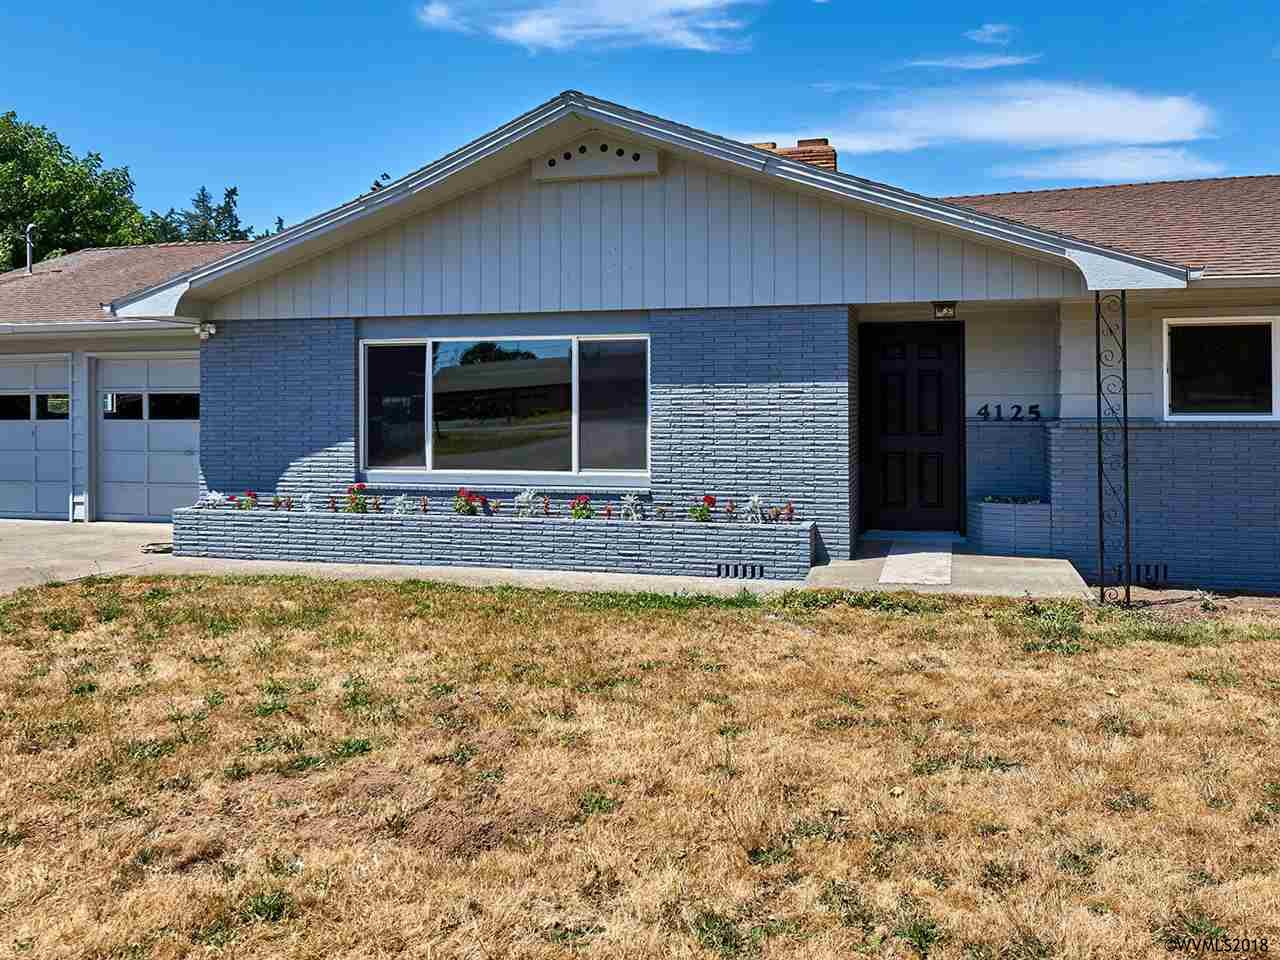 4125 Cordon Rd NE, Salem, Oregon